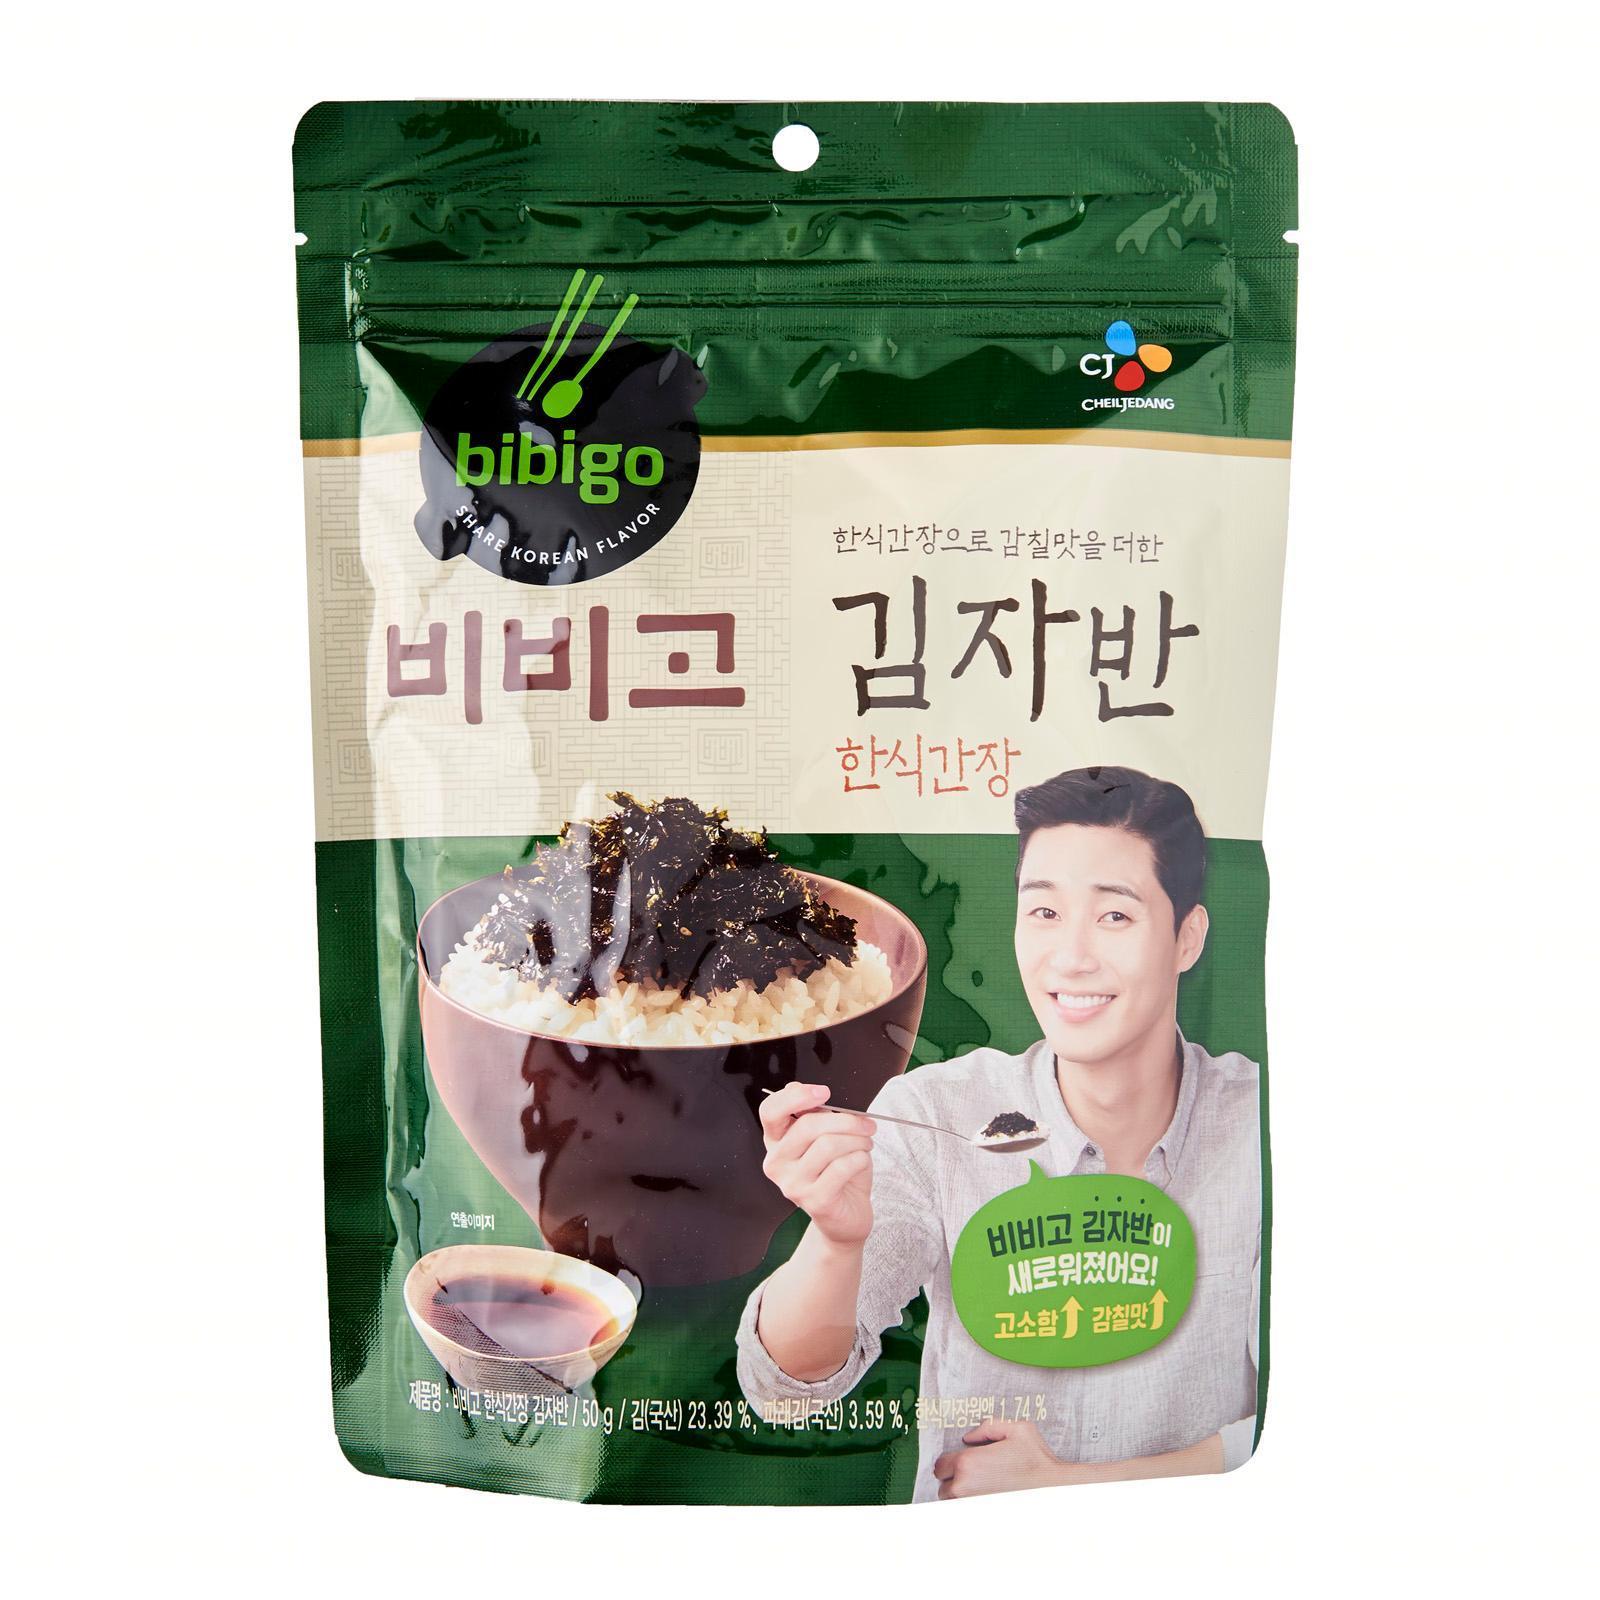 CJ Bibigo Korean Seaweed Flakes - Soy Sauce Flavor 50G